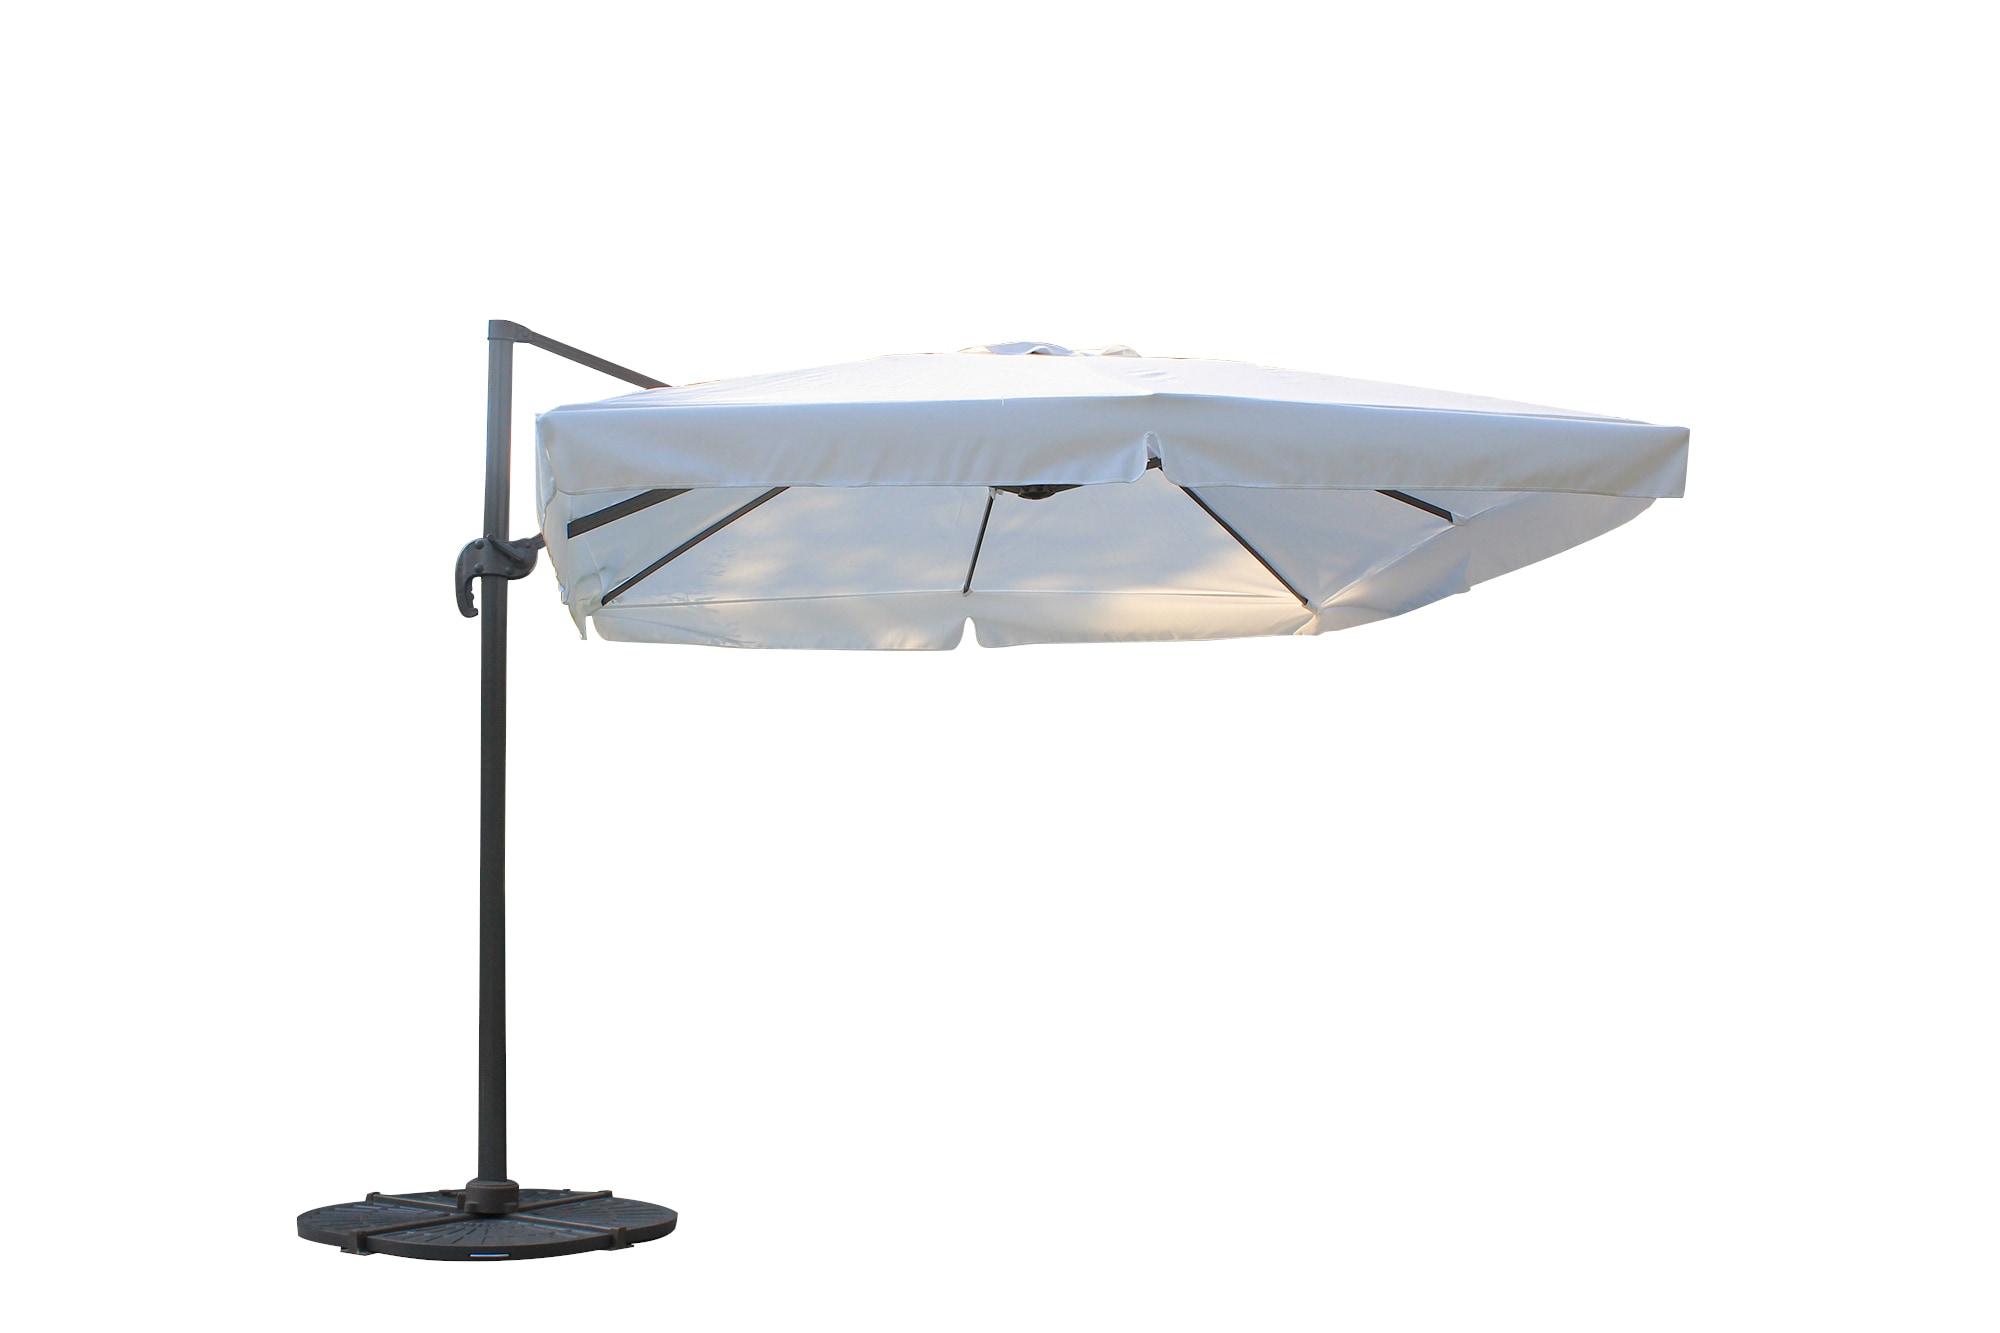 Kontiki Shade & Cooling fset Patio Umbrellas 10 ft Square fset